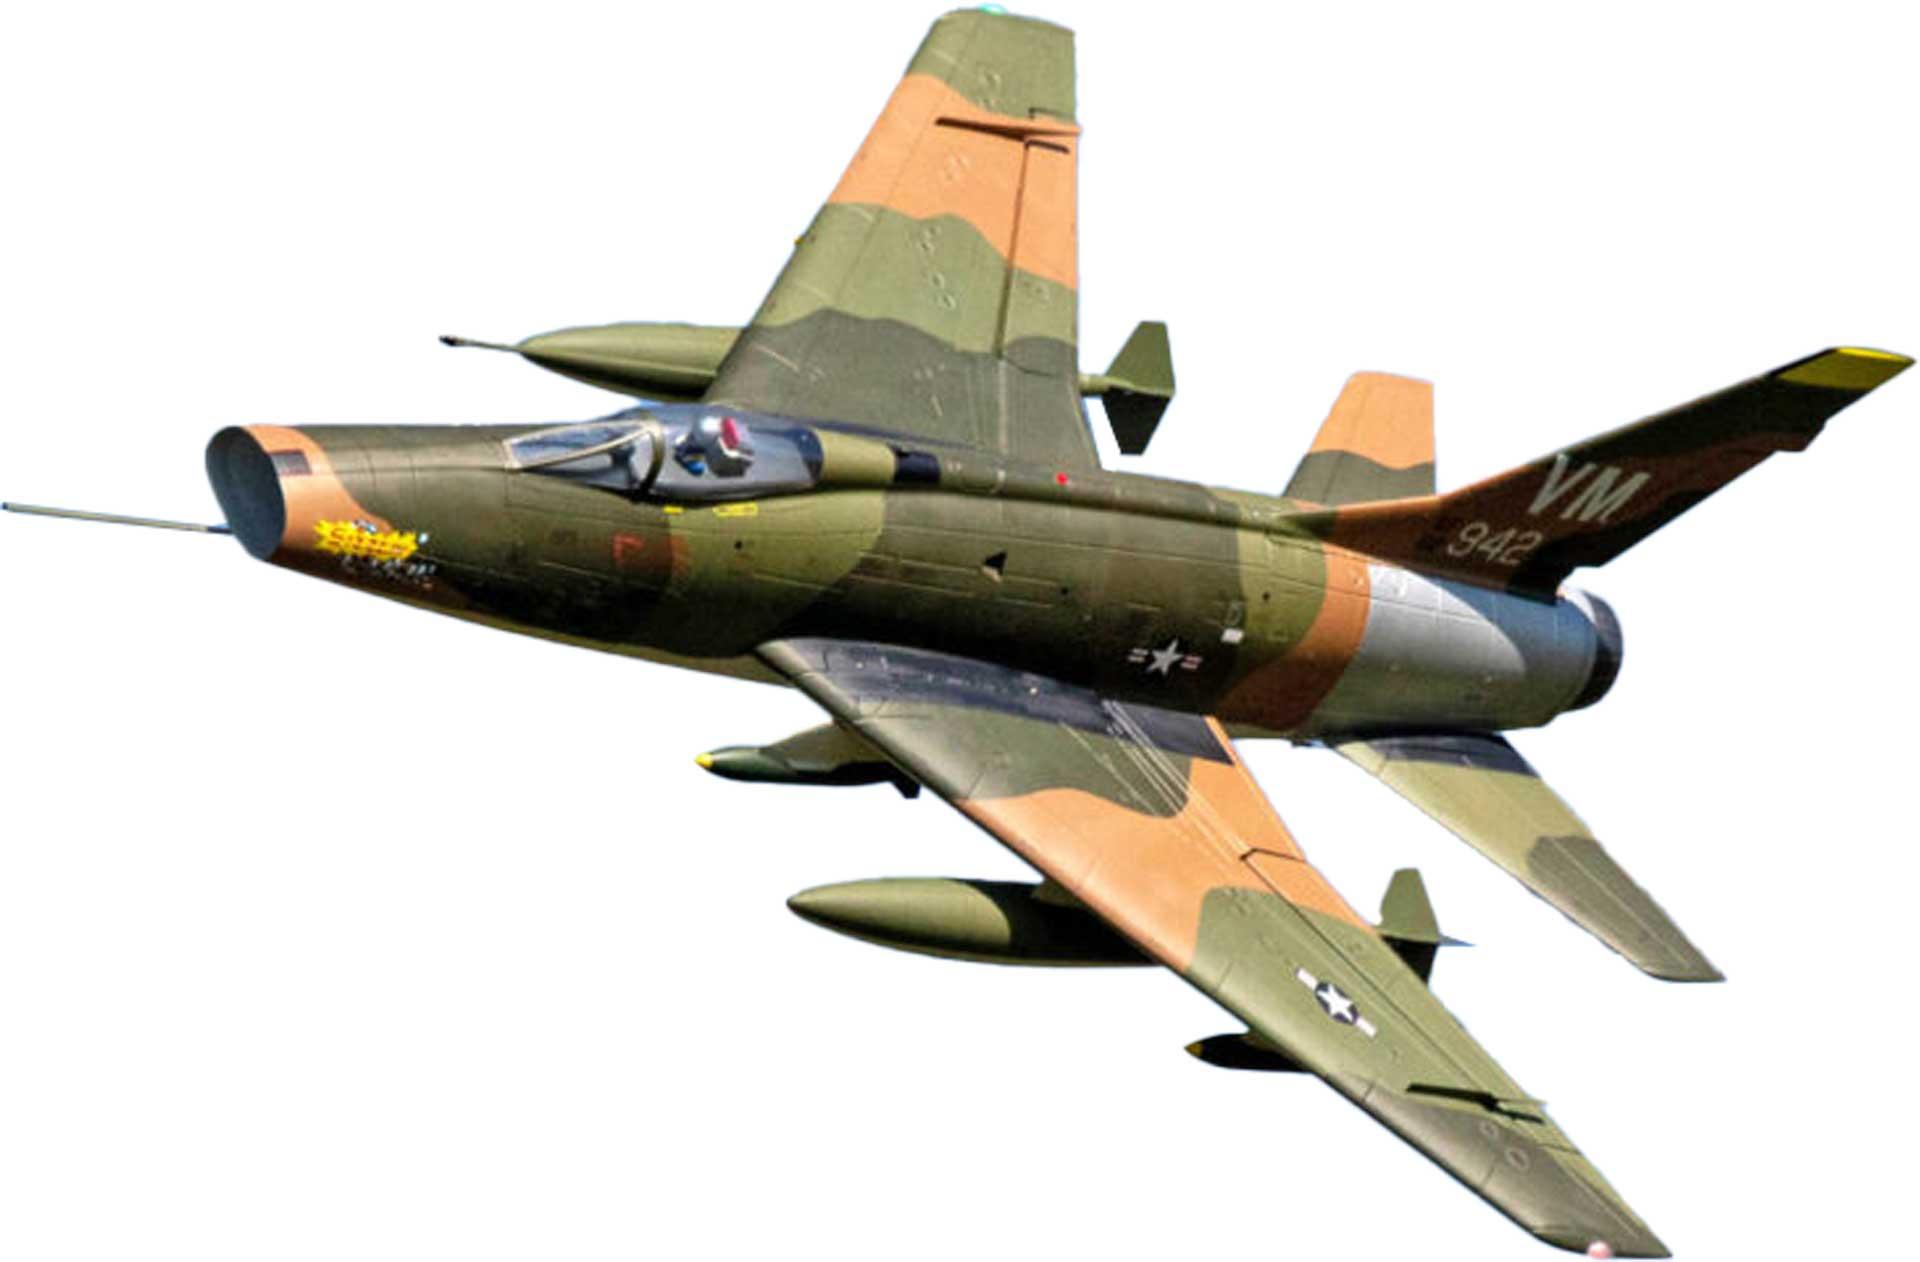 PREMIER AIRCRAFT F-100D SUPER SABRE GRÜN E-IMPELLER JET